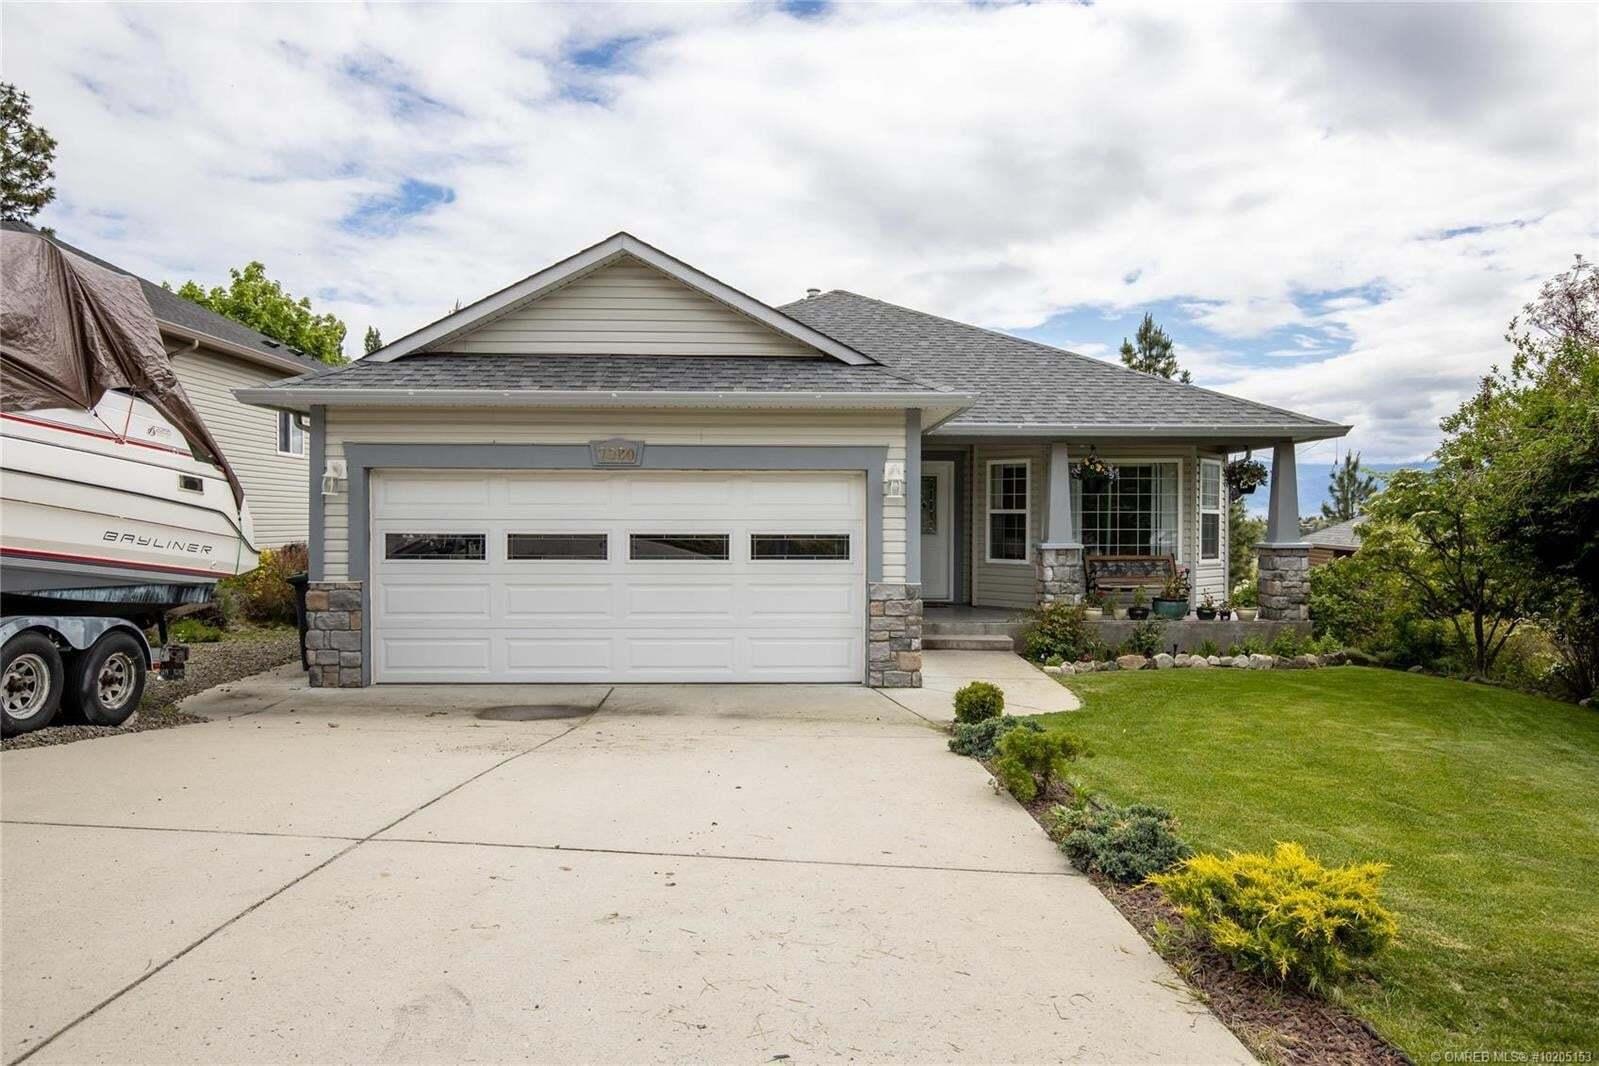 House for sale at 2080 Rosealee Ct West Kelowna British Columbia - MLS: 10205153